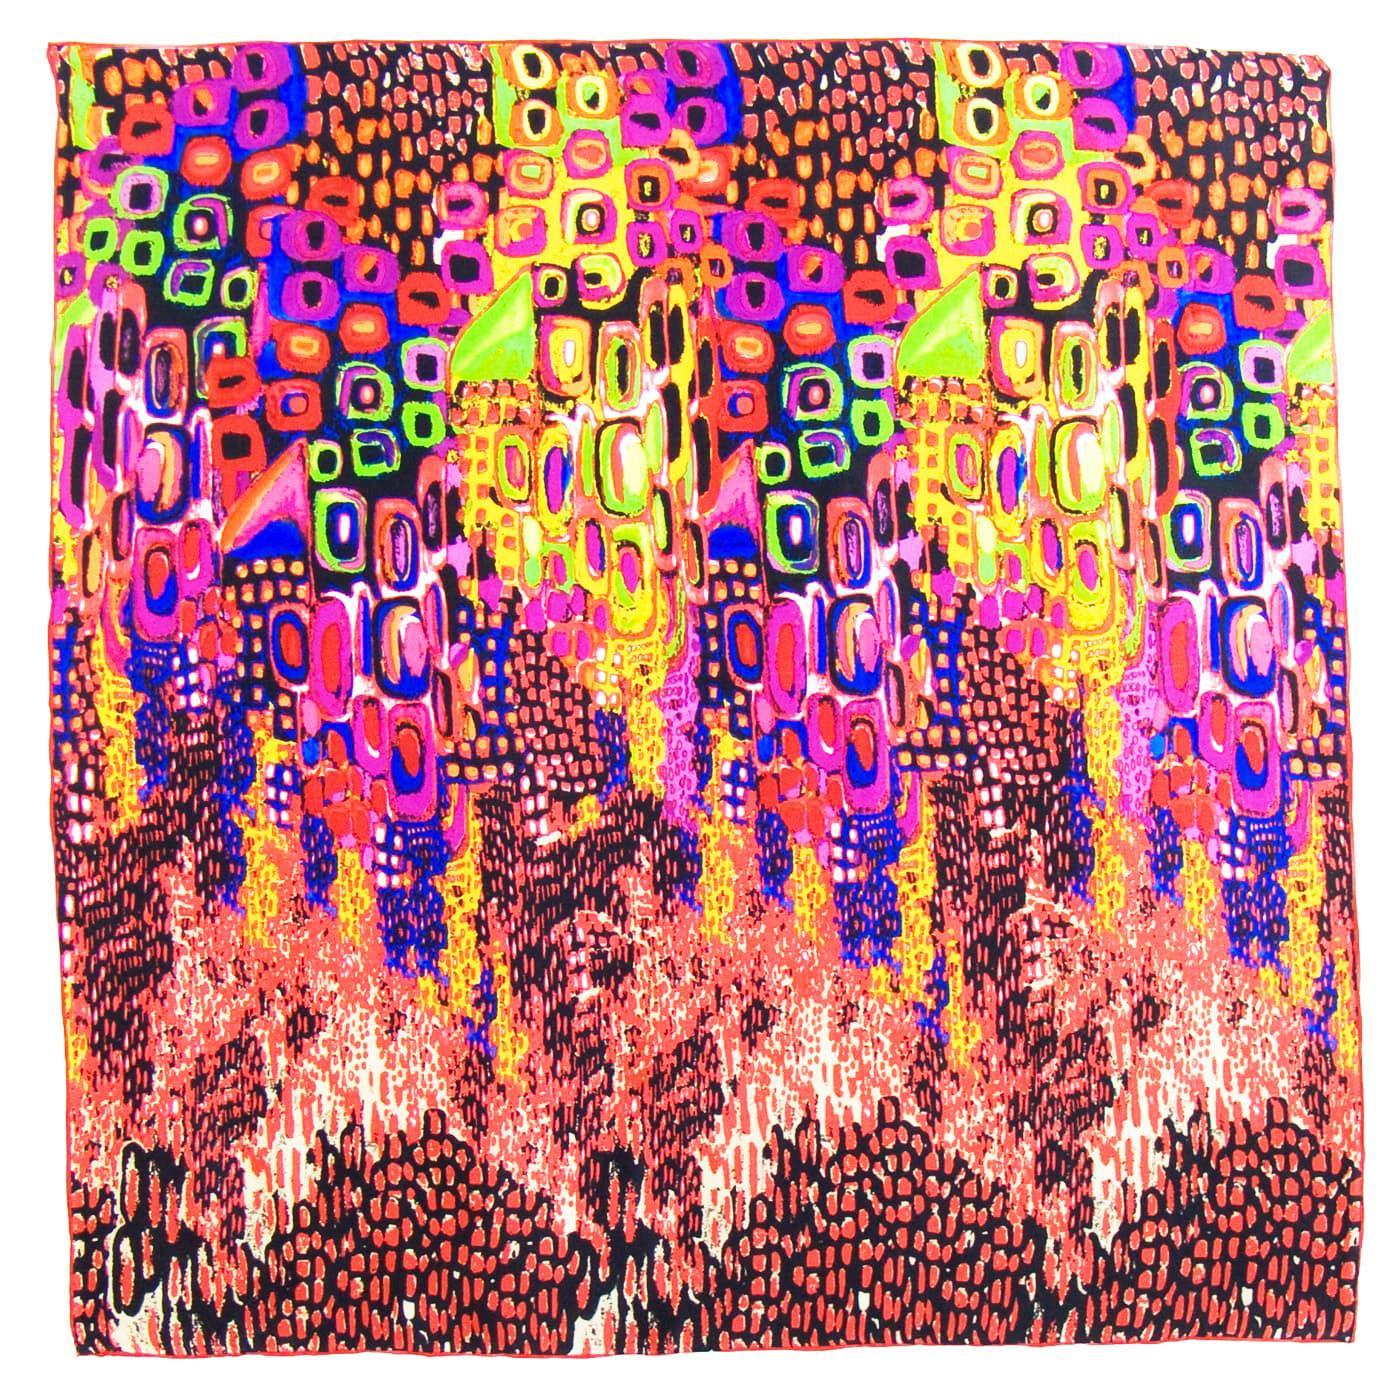 Foulard en soie satin corail colorima premium 90 x 90 cm